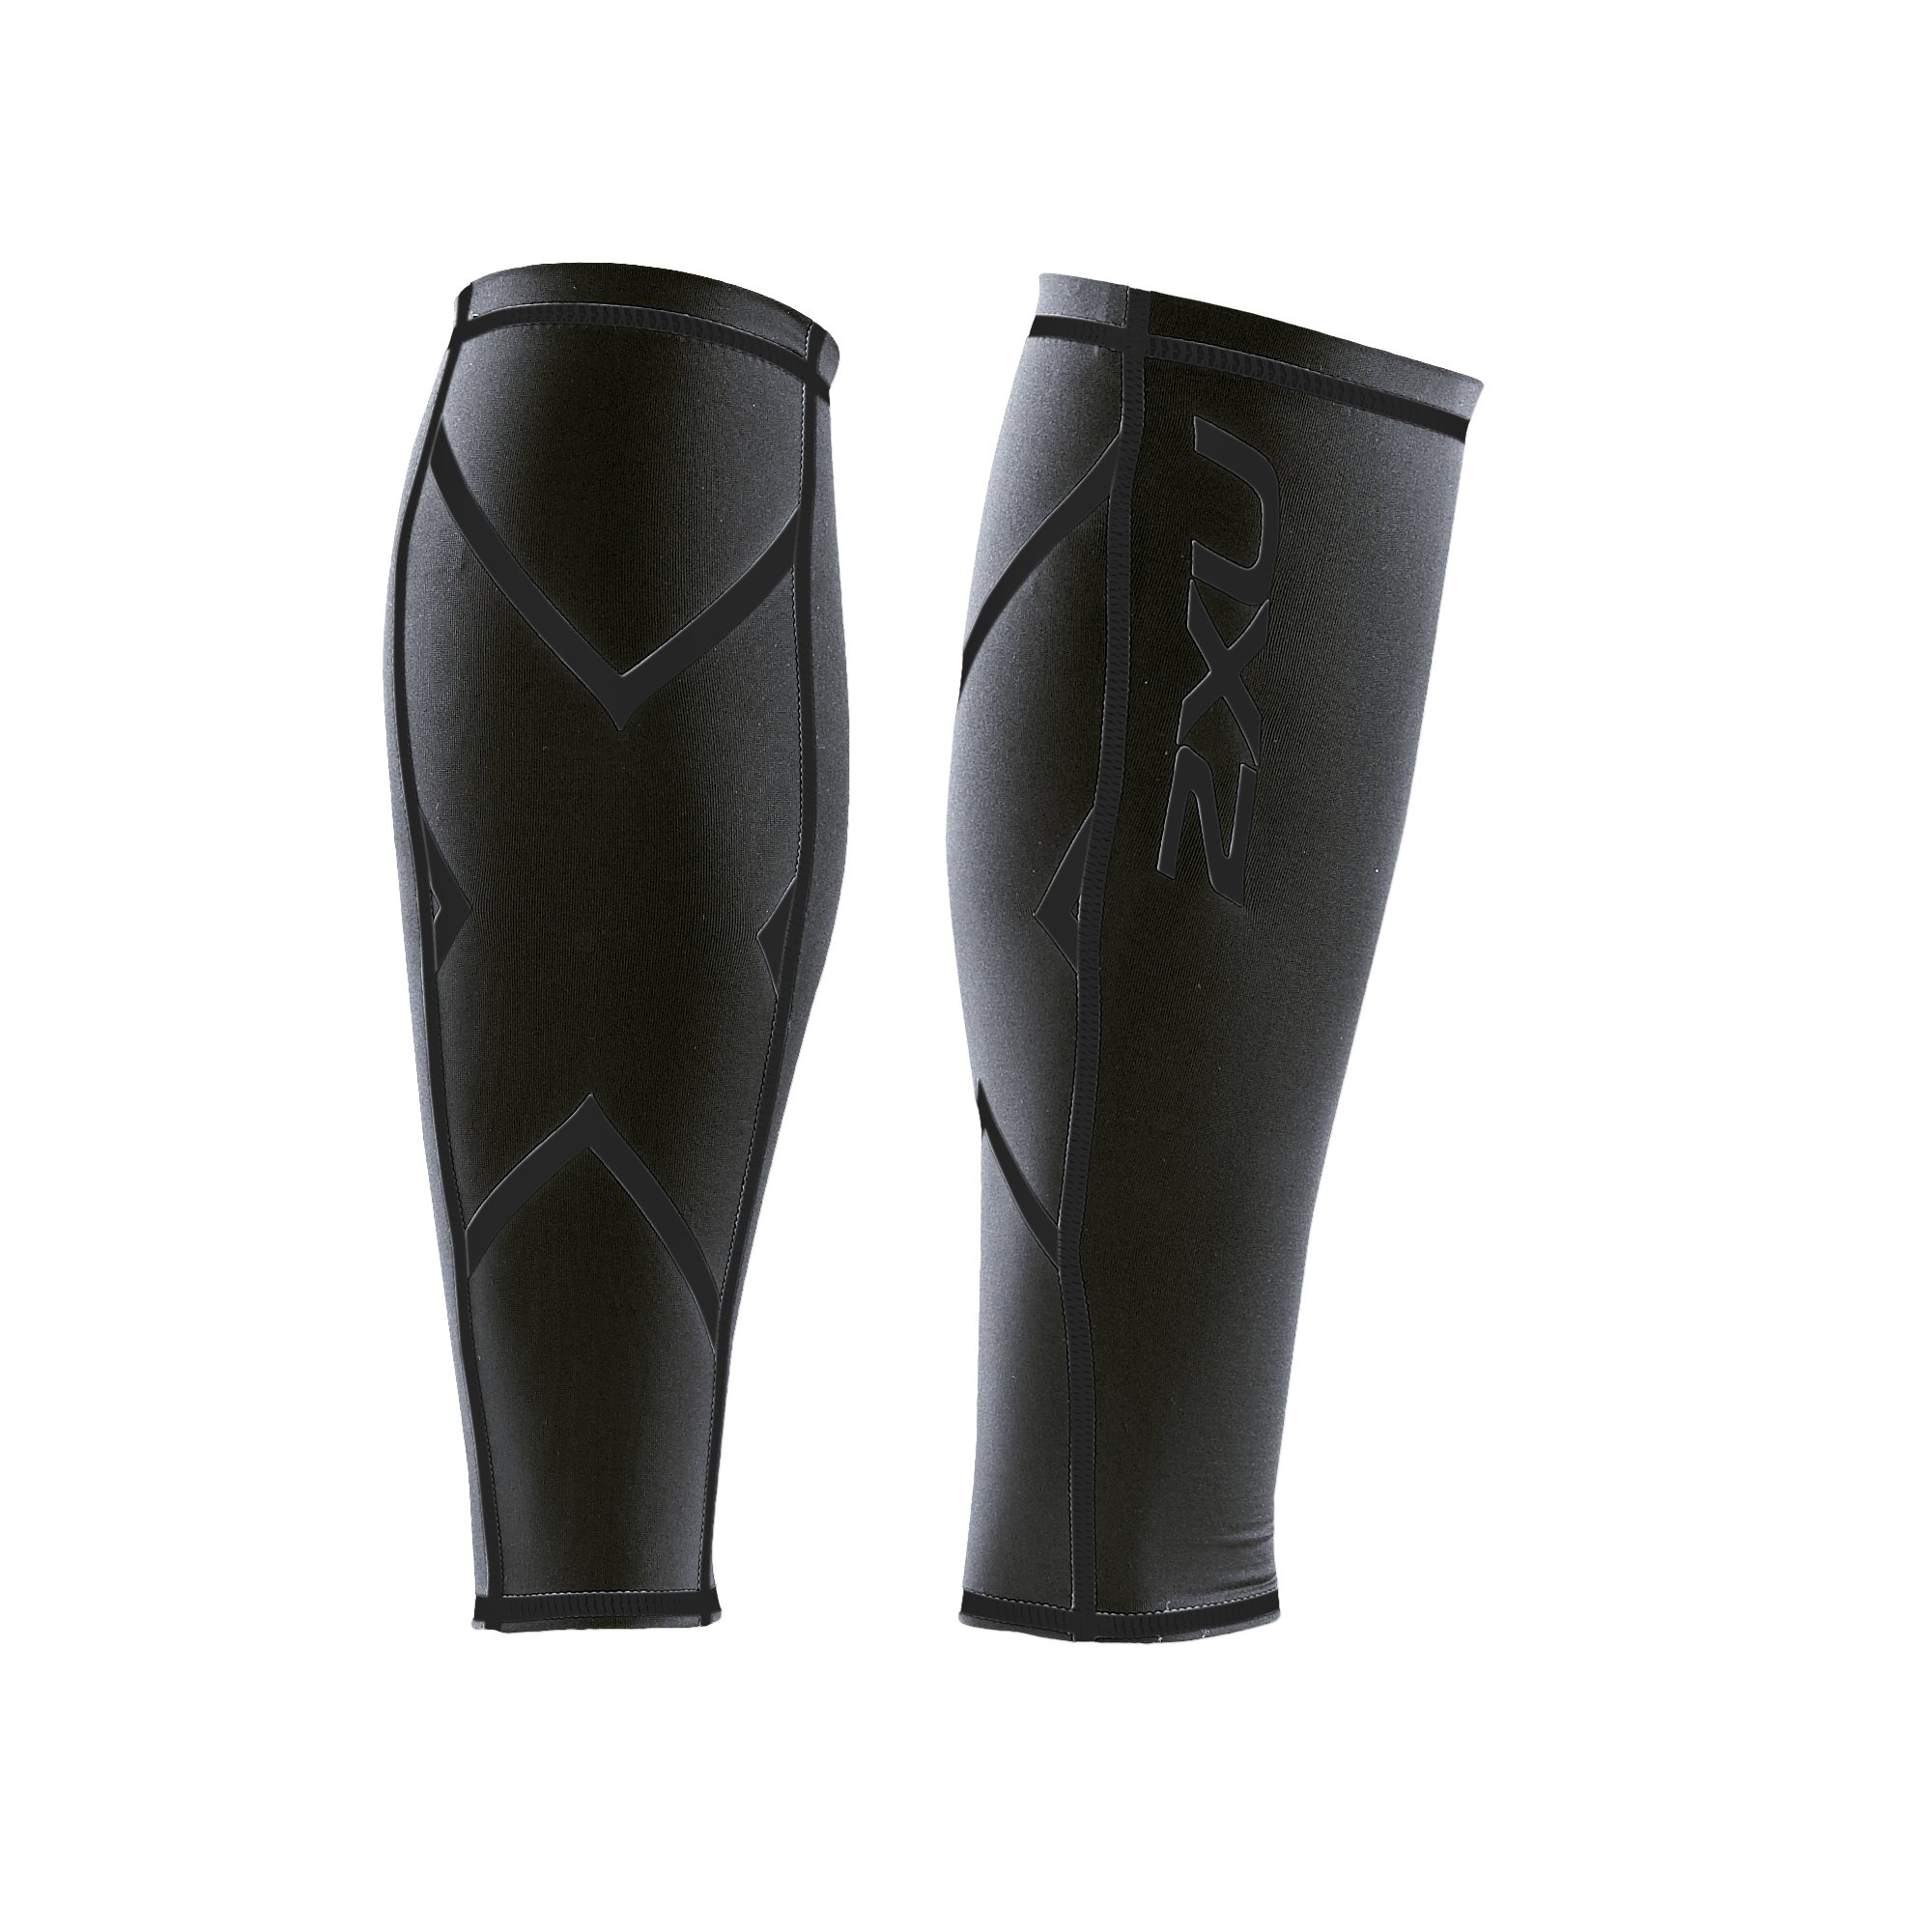 2XU Compression Calf Guards, Steel/Black